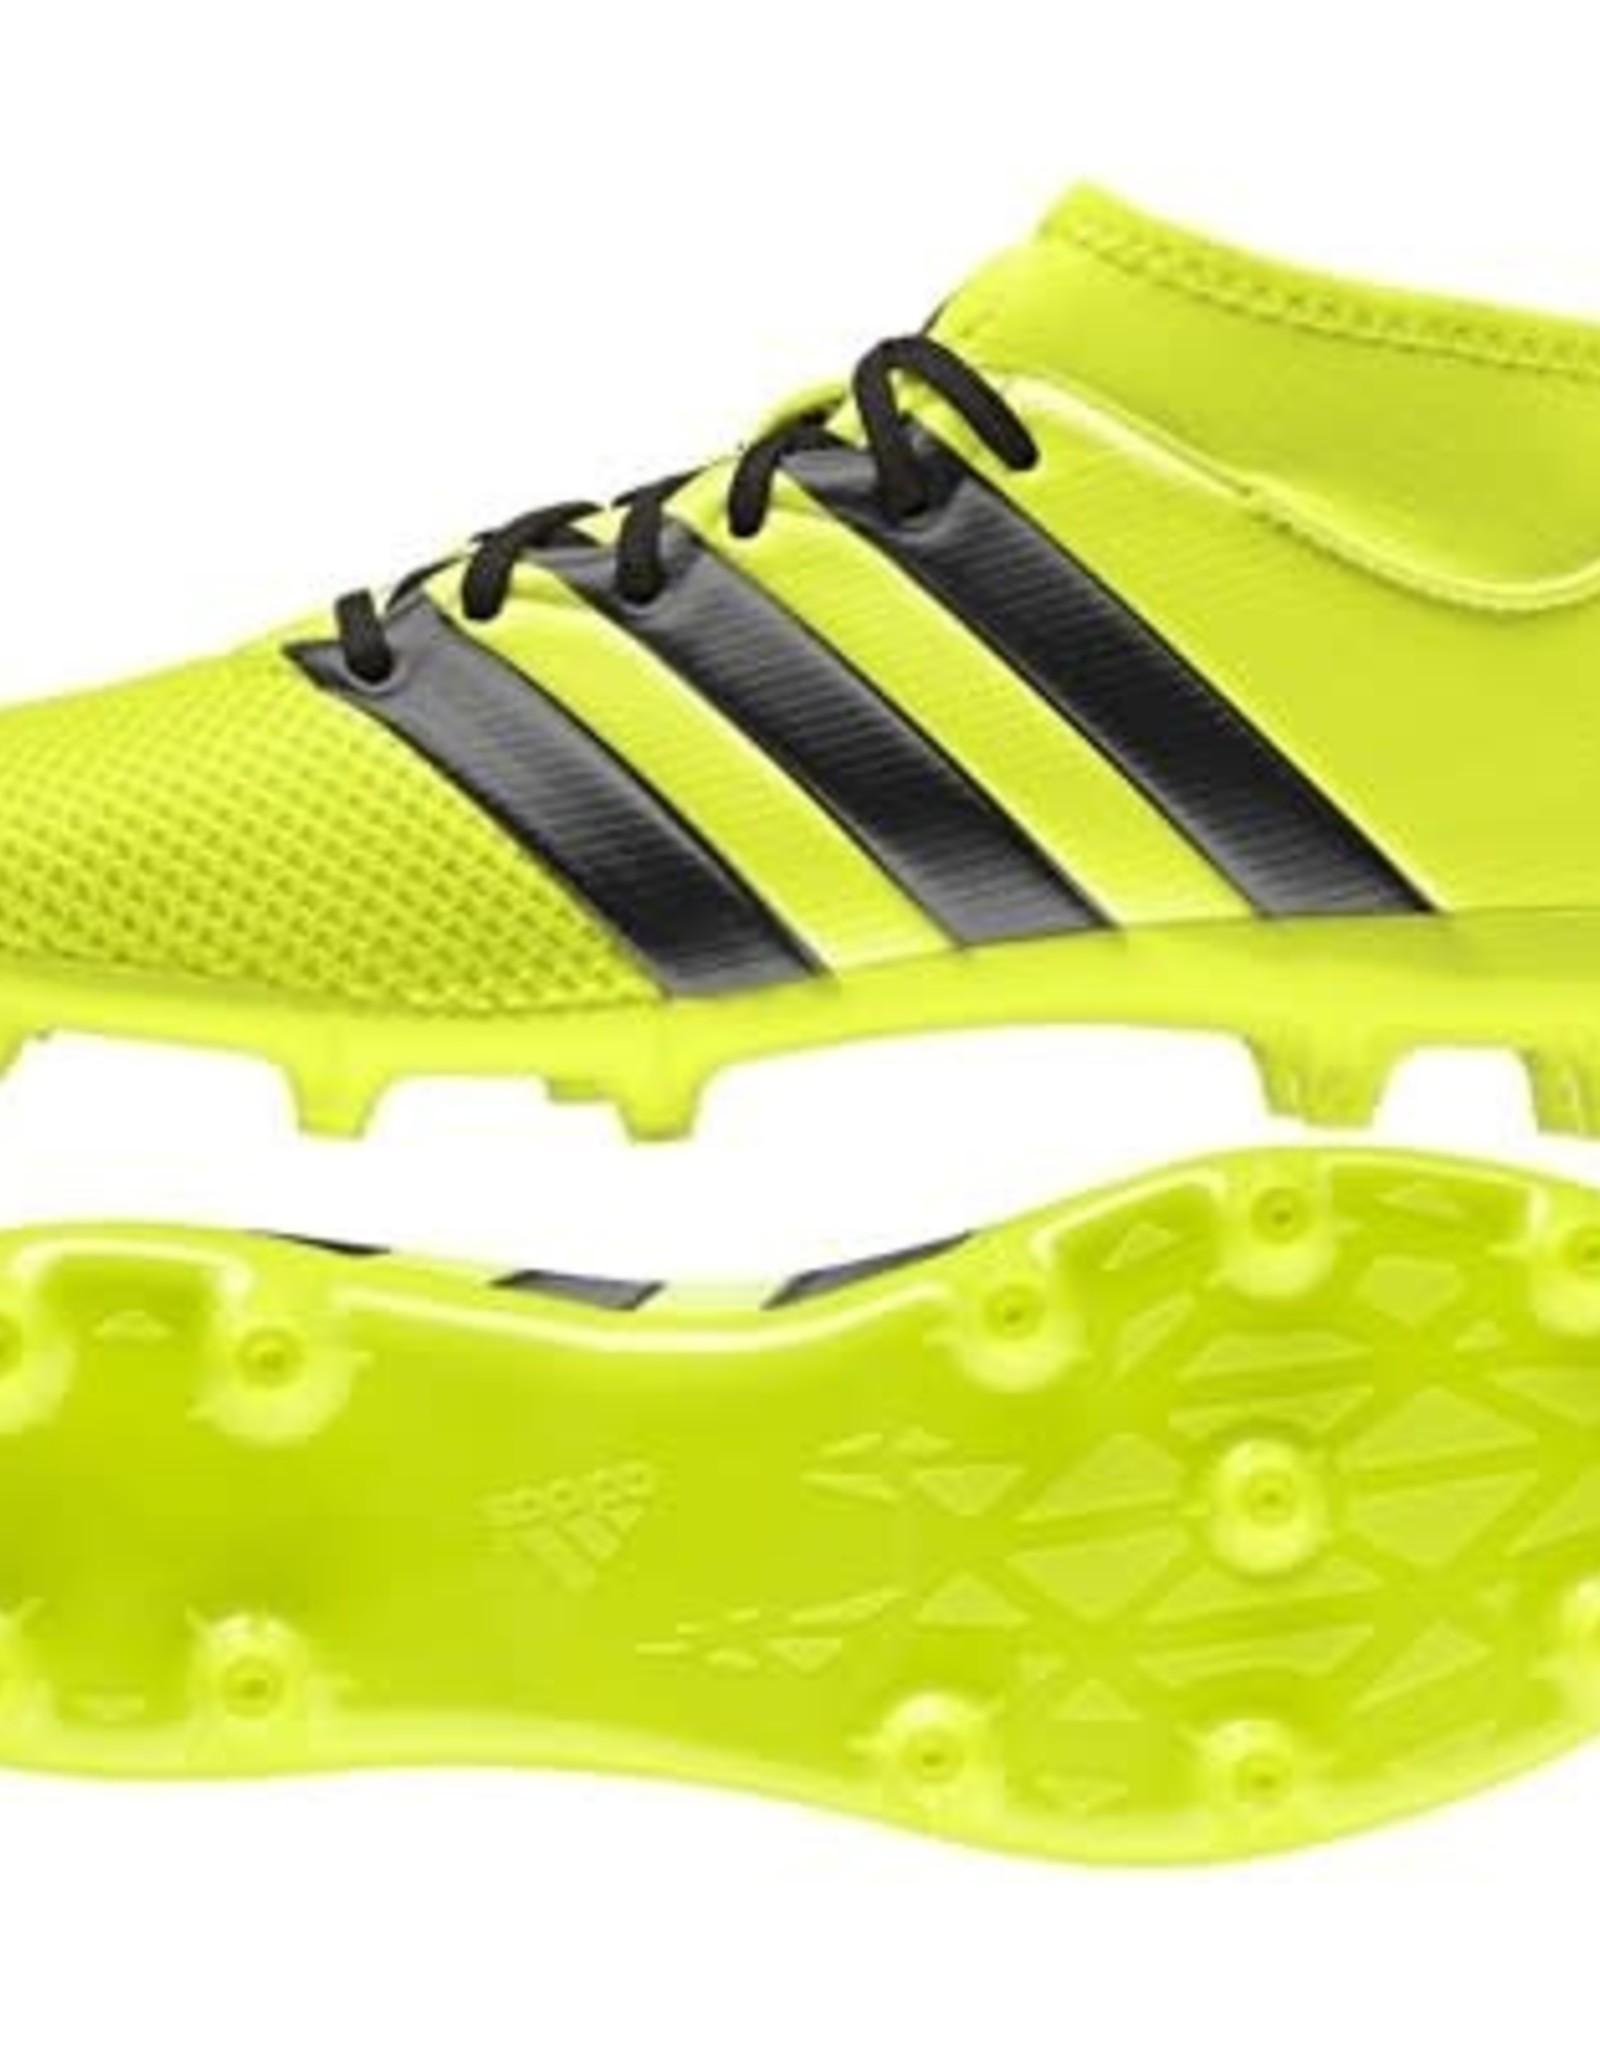 Adidas 16.3 Primemesh Youth FG